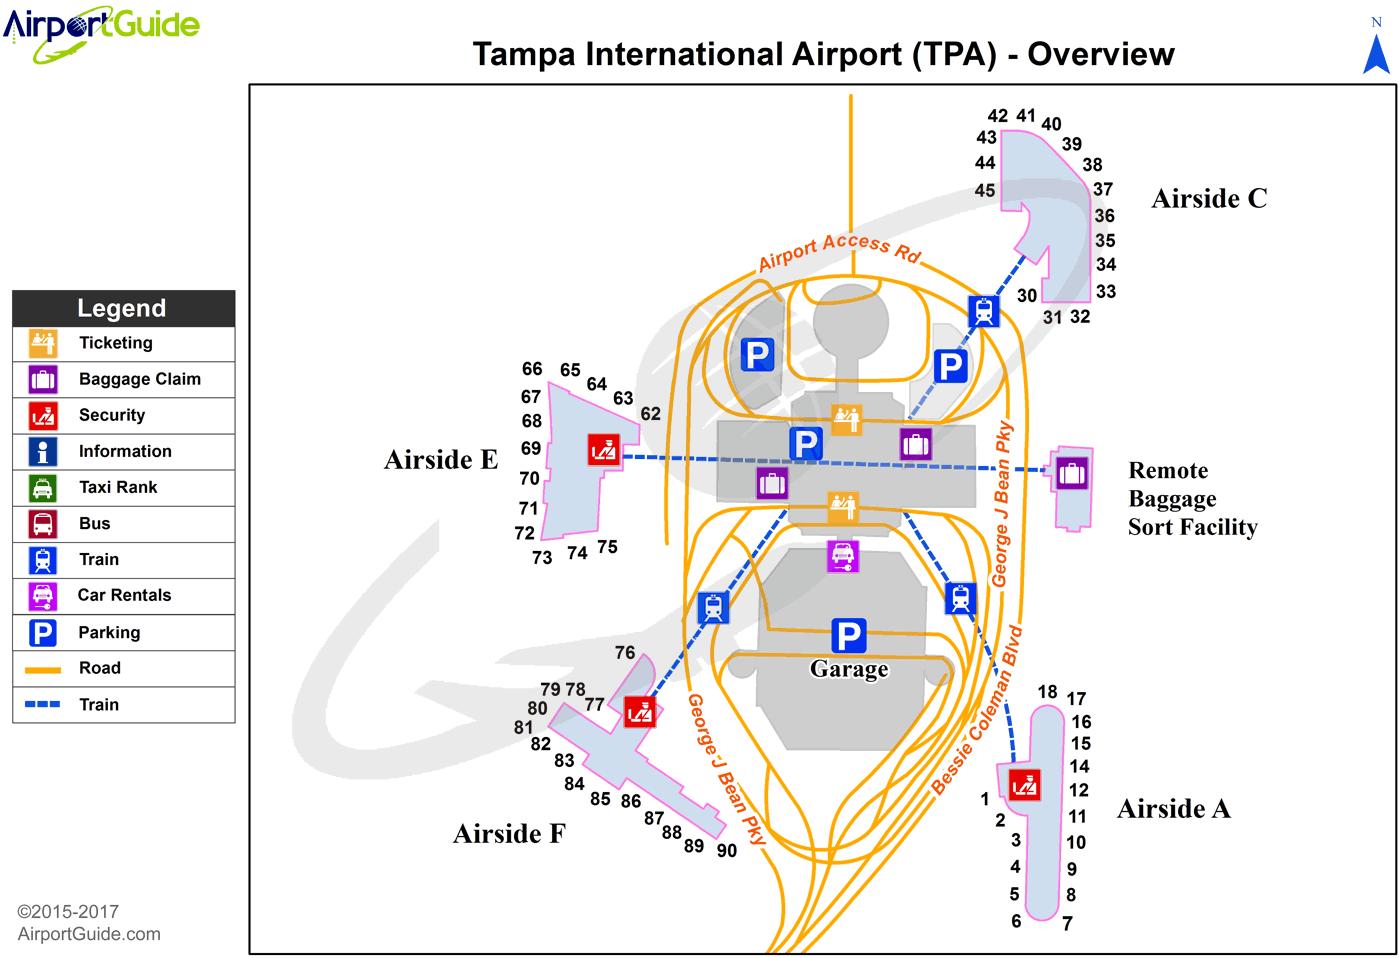 Tampa Airport Map Tampa   Tampa International (TPA) Airport Terminal Map   Overview  Tampa Airport Map